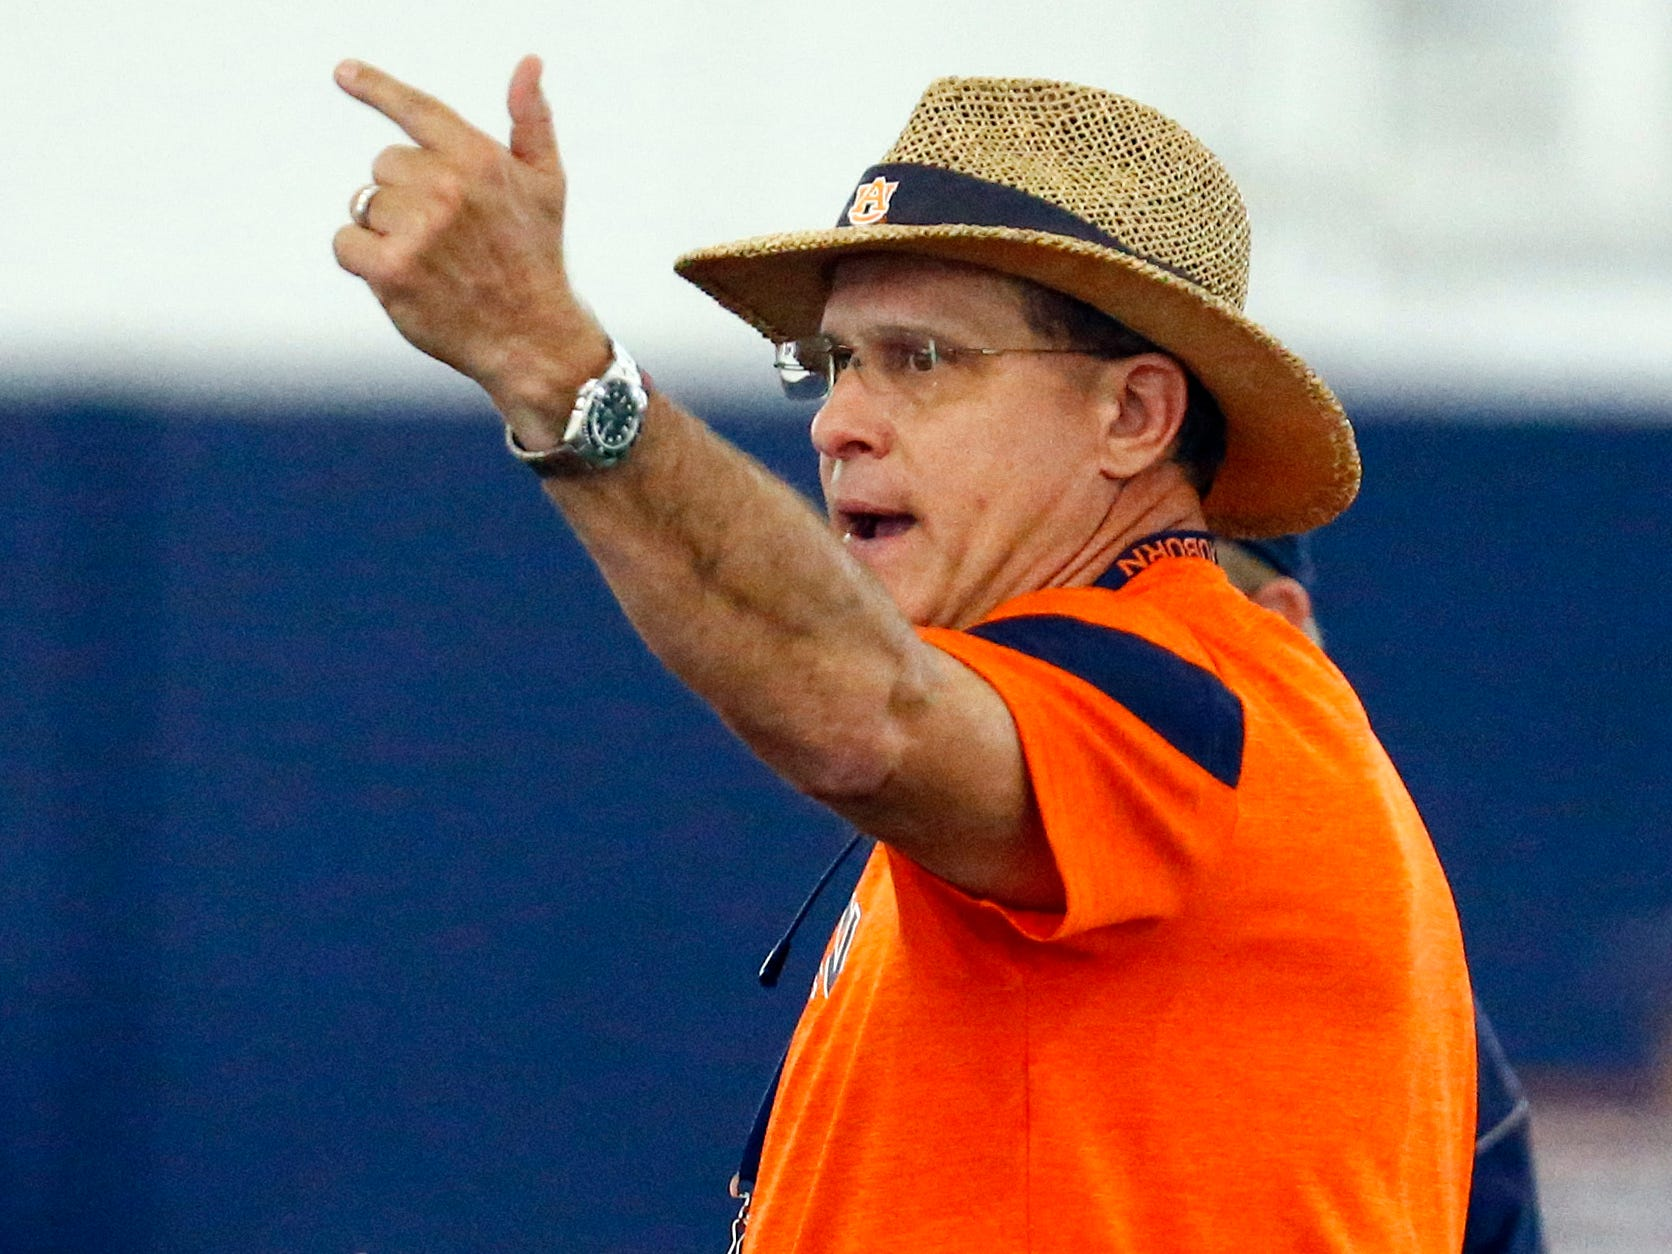 Auburn head coach Gus Malzahn reacts during NCAA college foottball practice, Friday, Aug. 3, 2018, in Auburn, Ala. (AP Photo/Butch Dill)